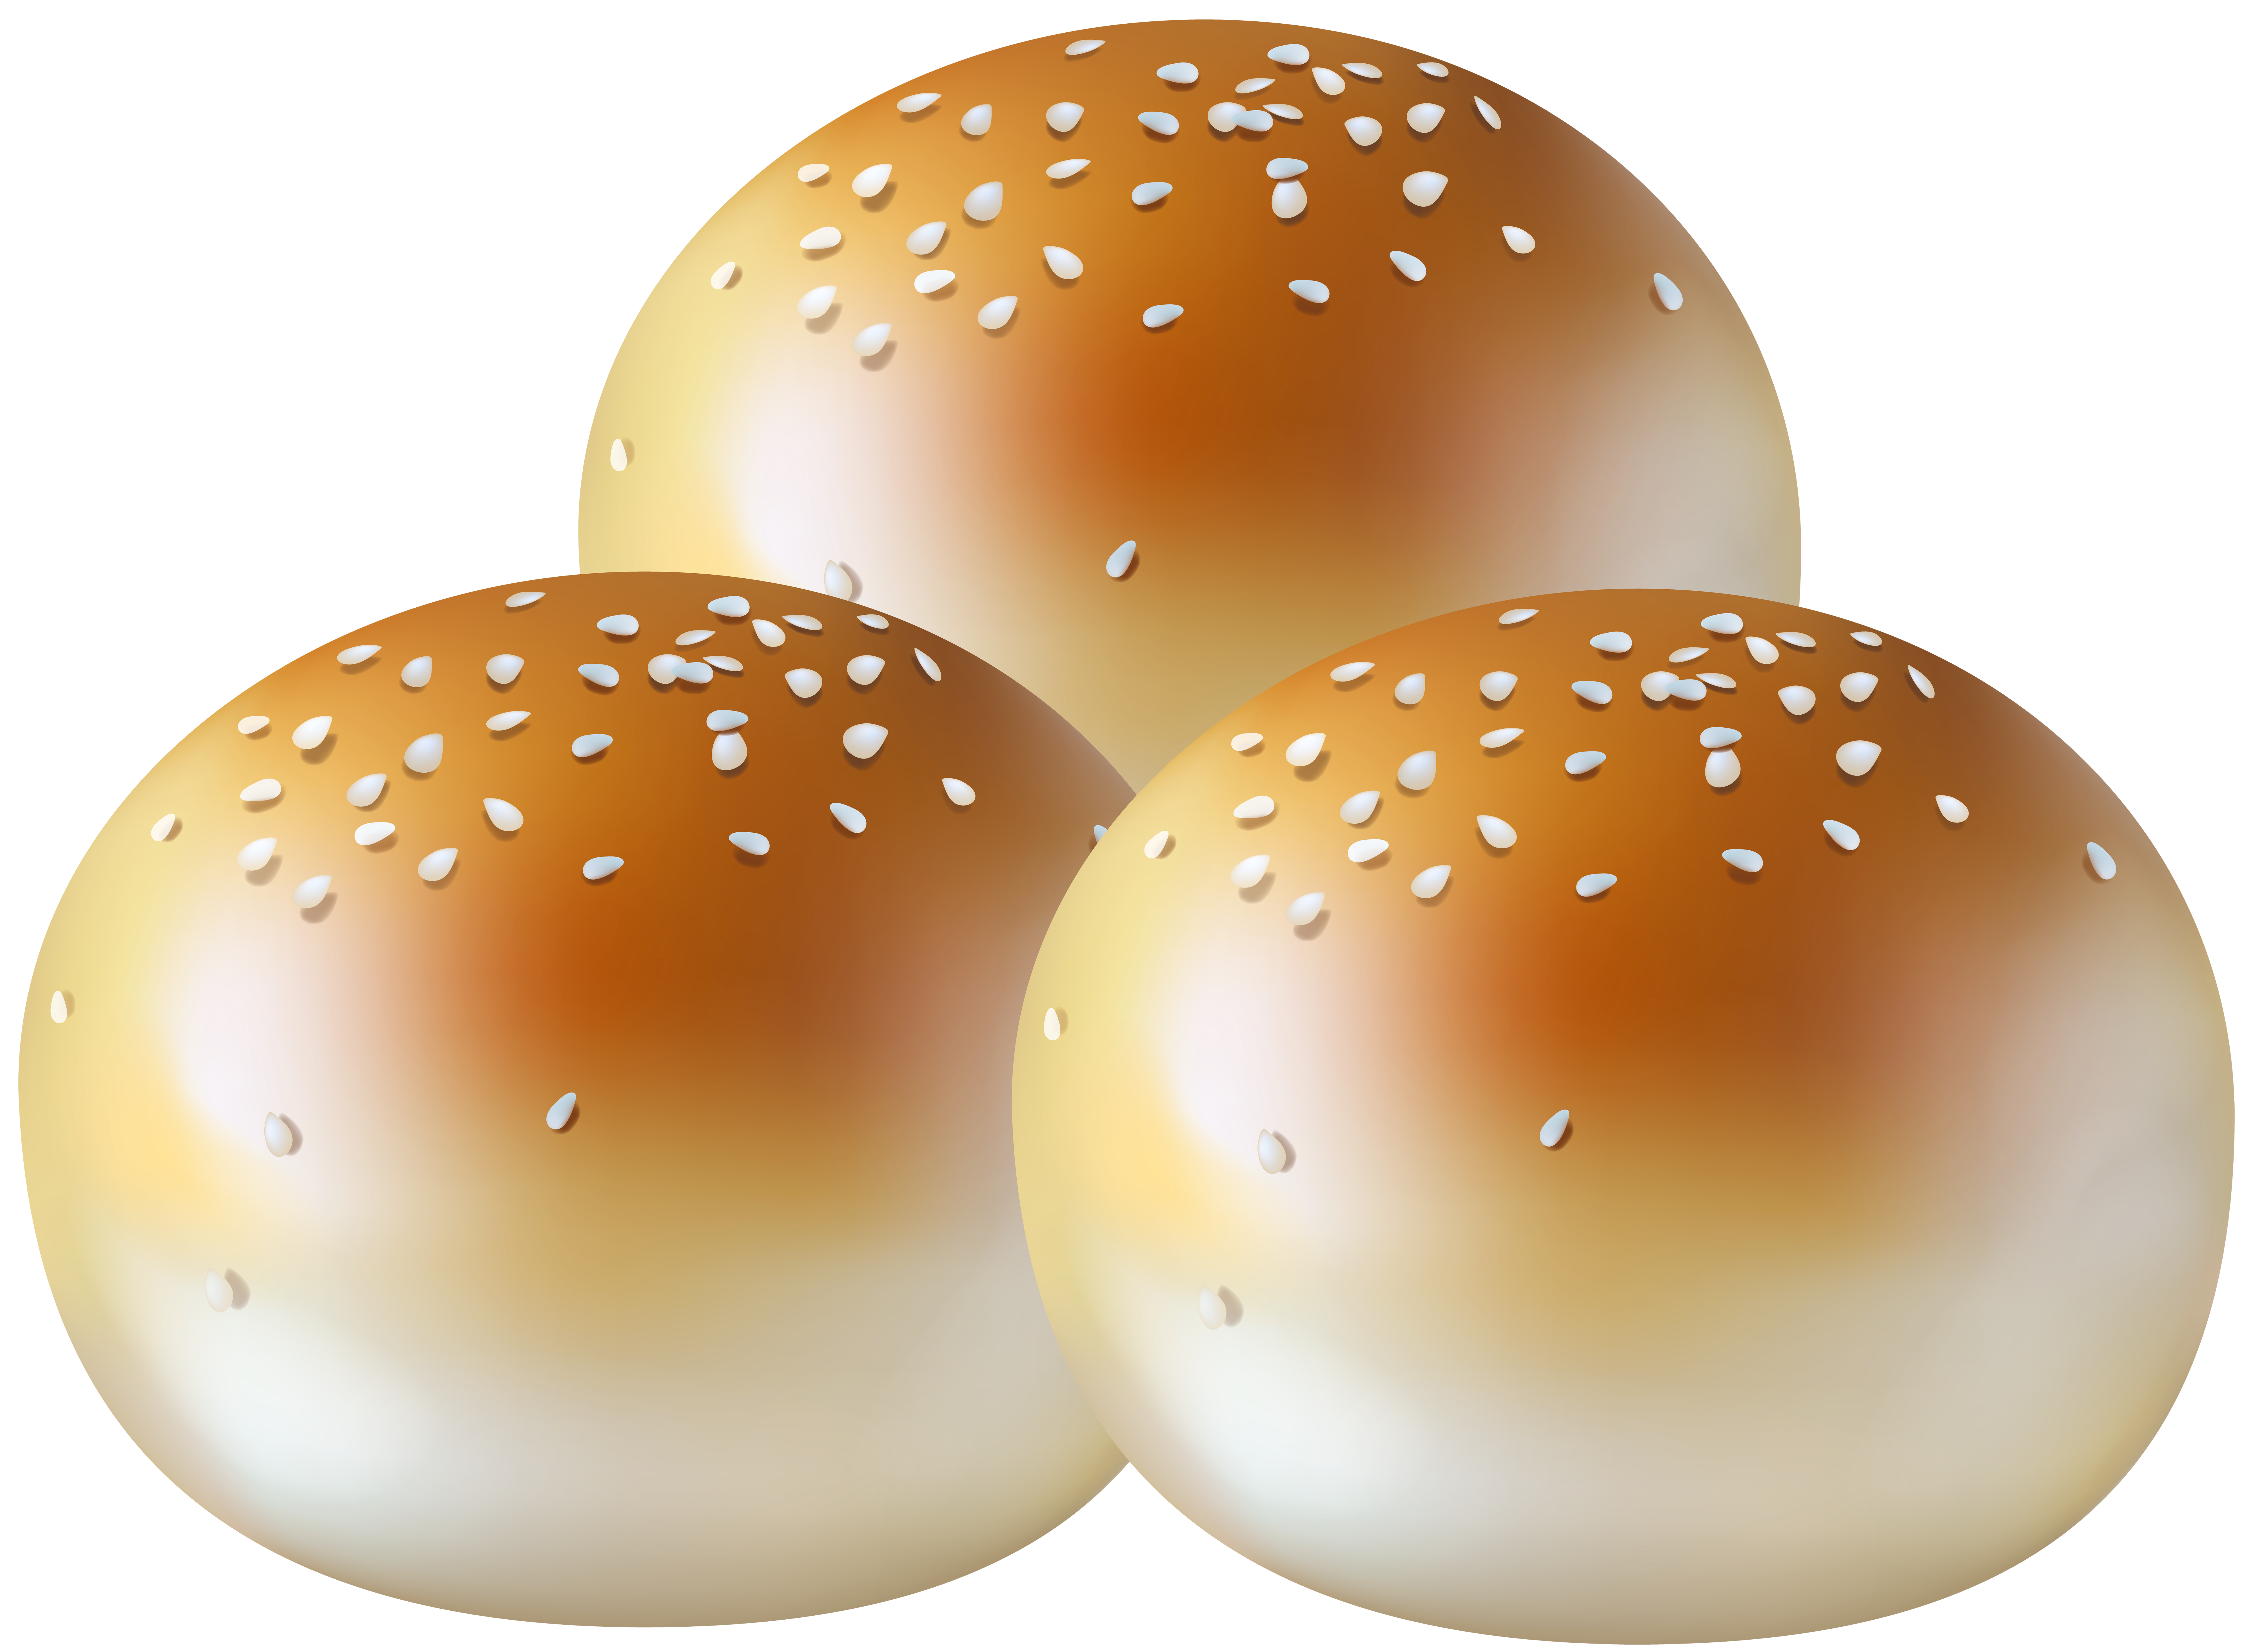 Bun clipart clip art royalty free stock Burger Buns PNG Clipart - Best WEB Clipart clip art royalty free stock